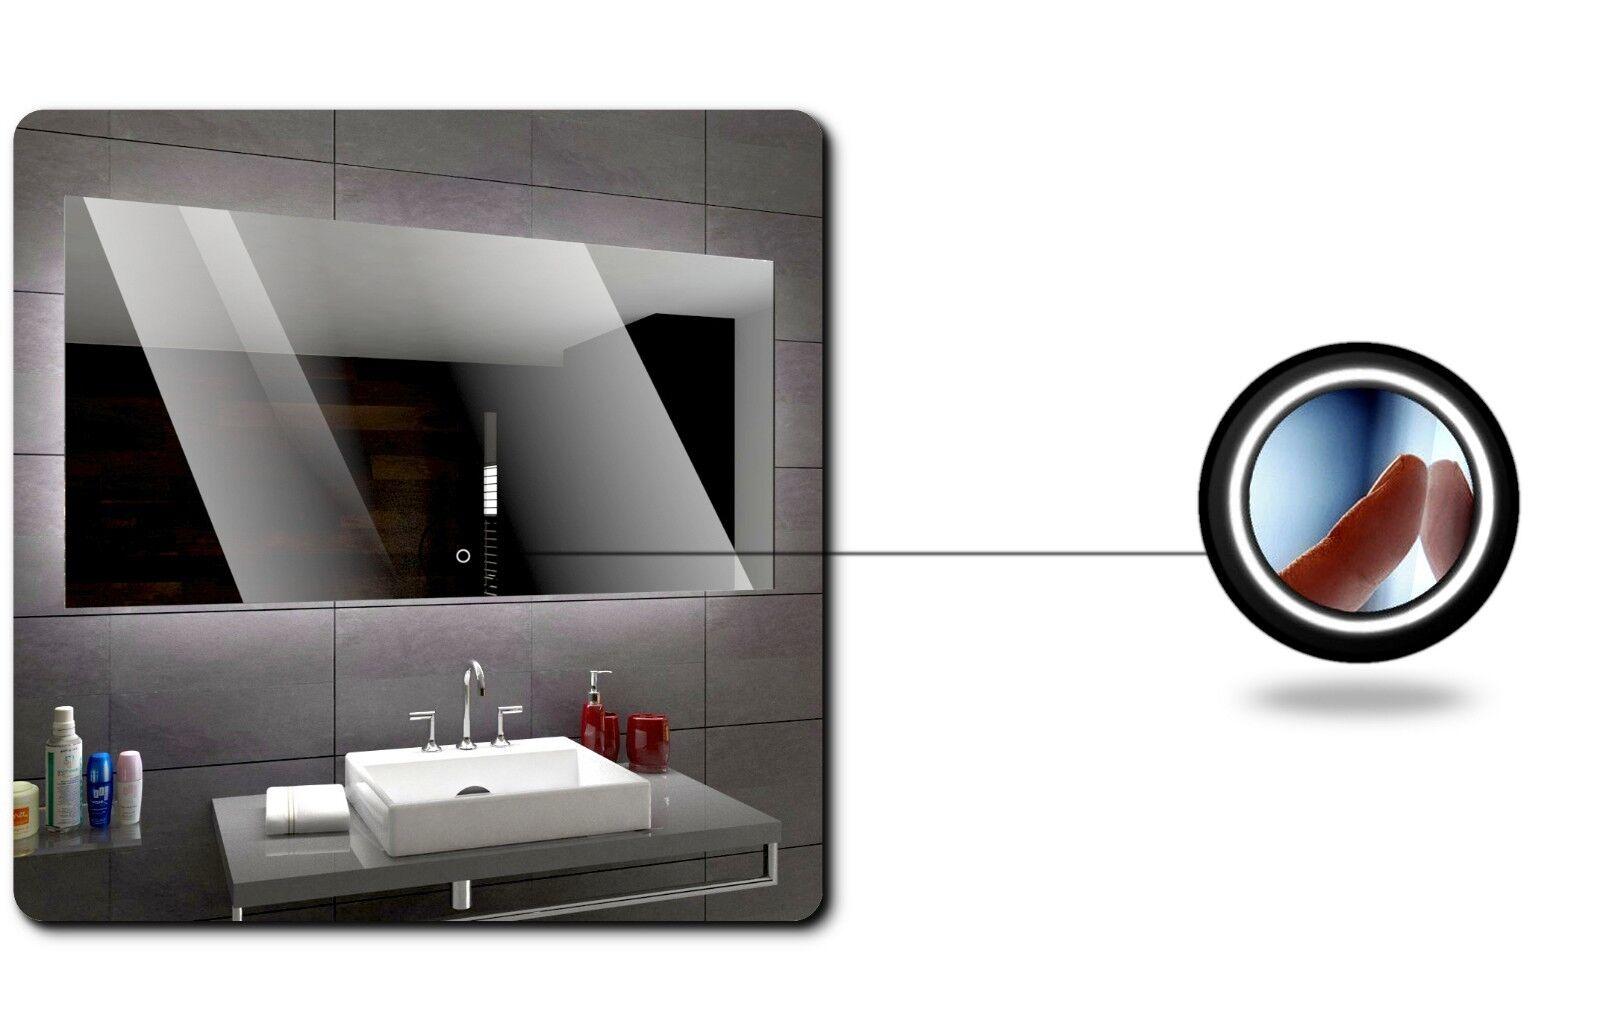 Hobart  Espejo de baño con iluminación LED pa rojo  Hobart Touch azultooth Reloj 5b9beb